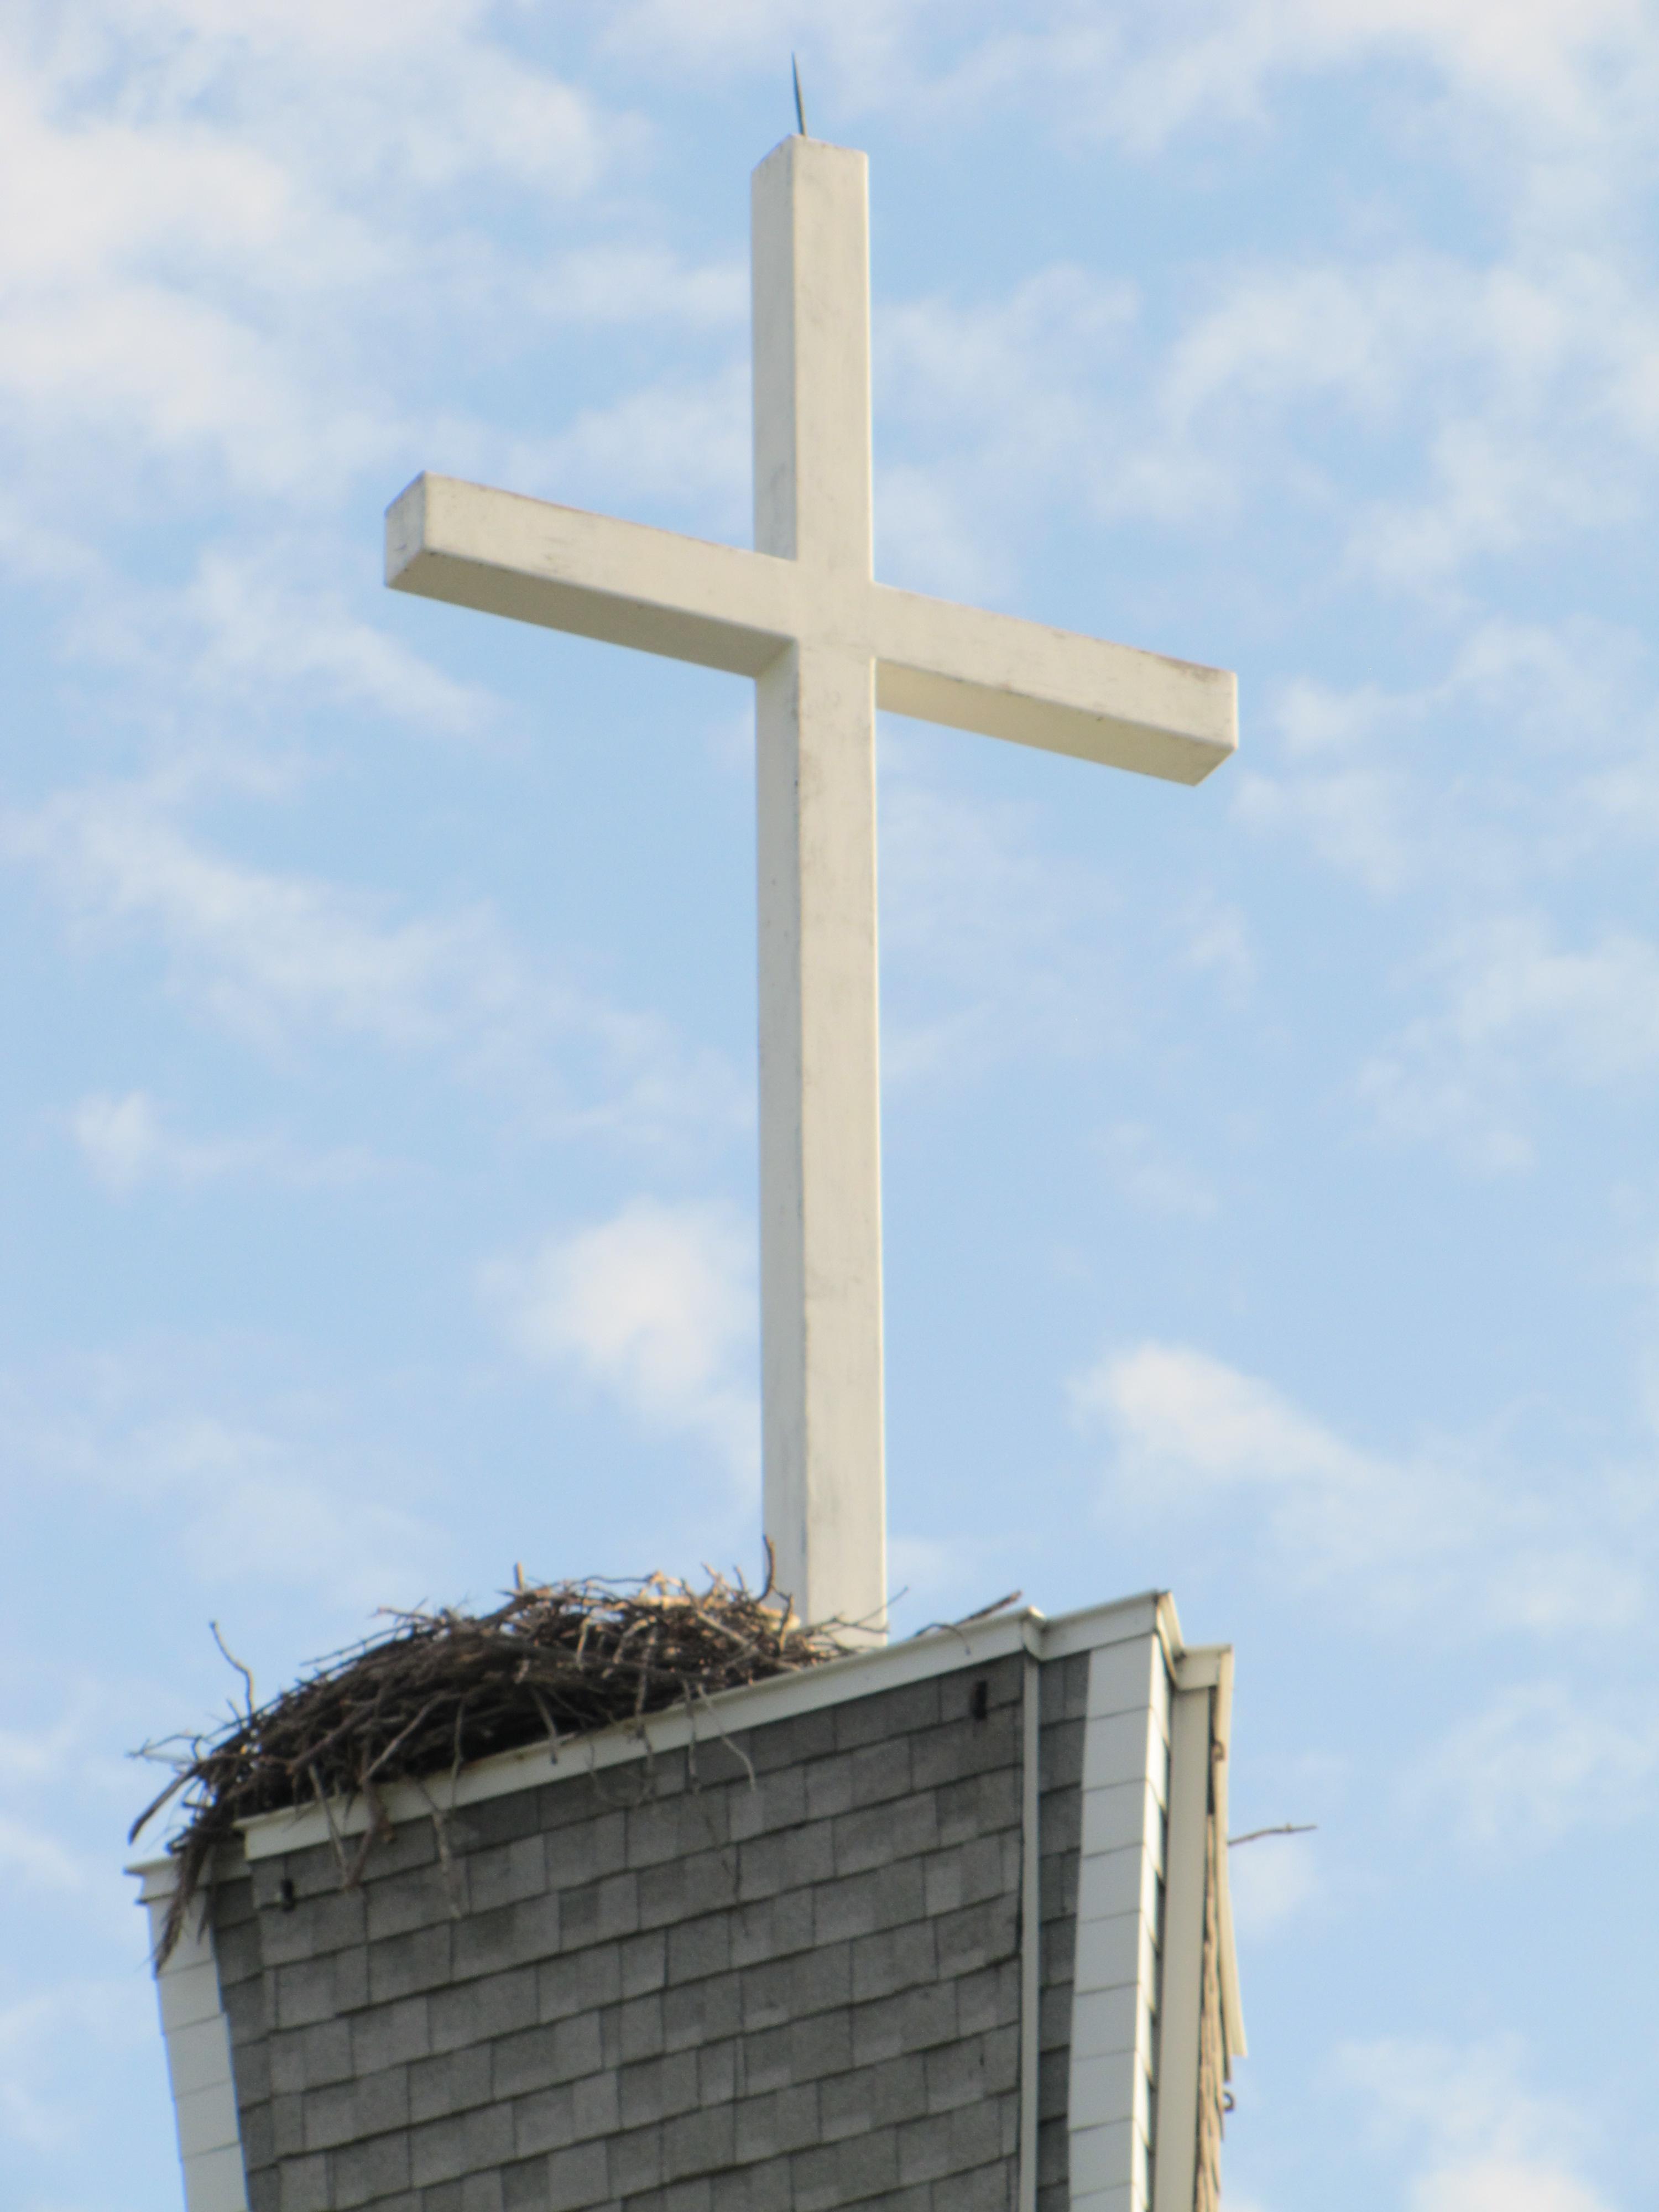 osprey nest atop steeple of gloria dei luthern church on anna maria island florida